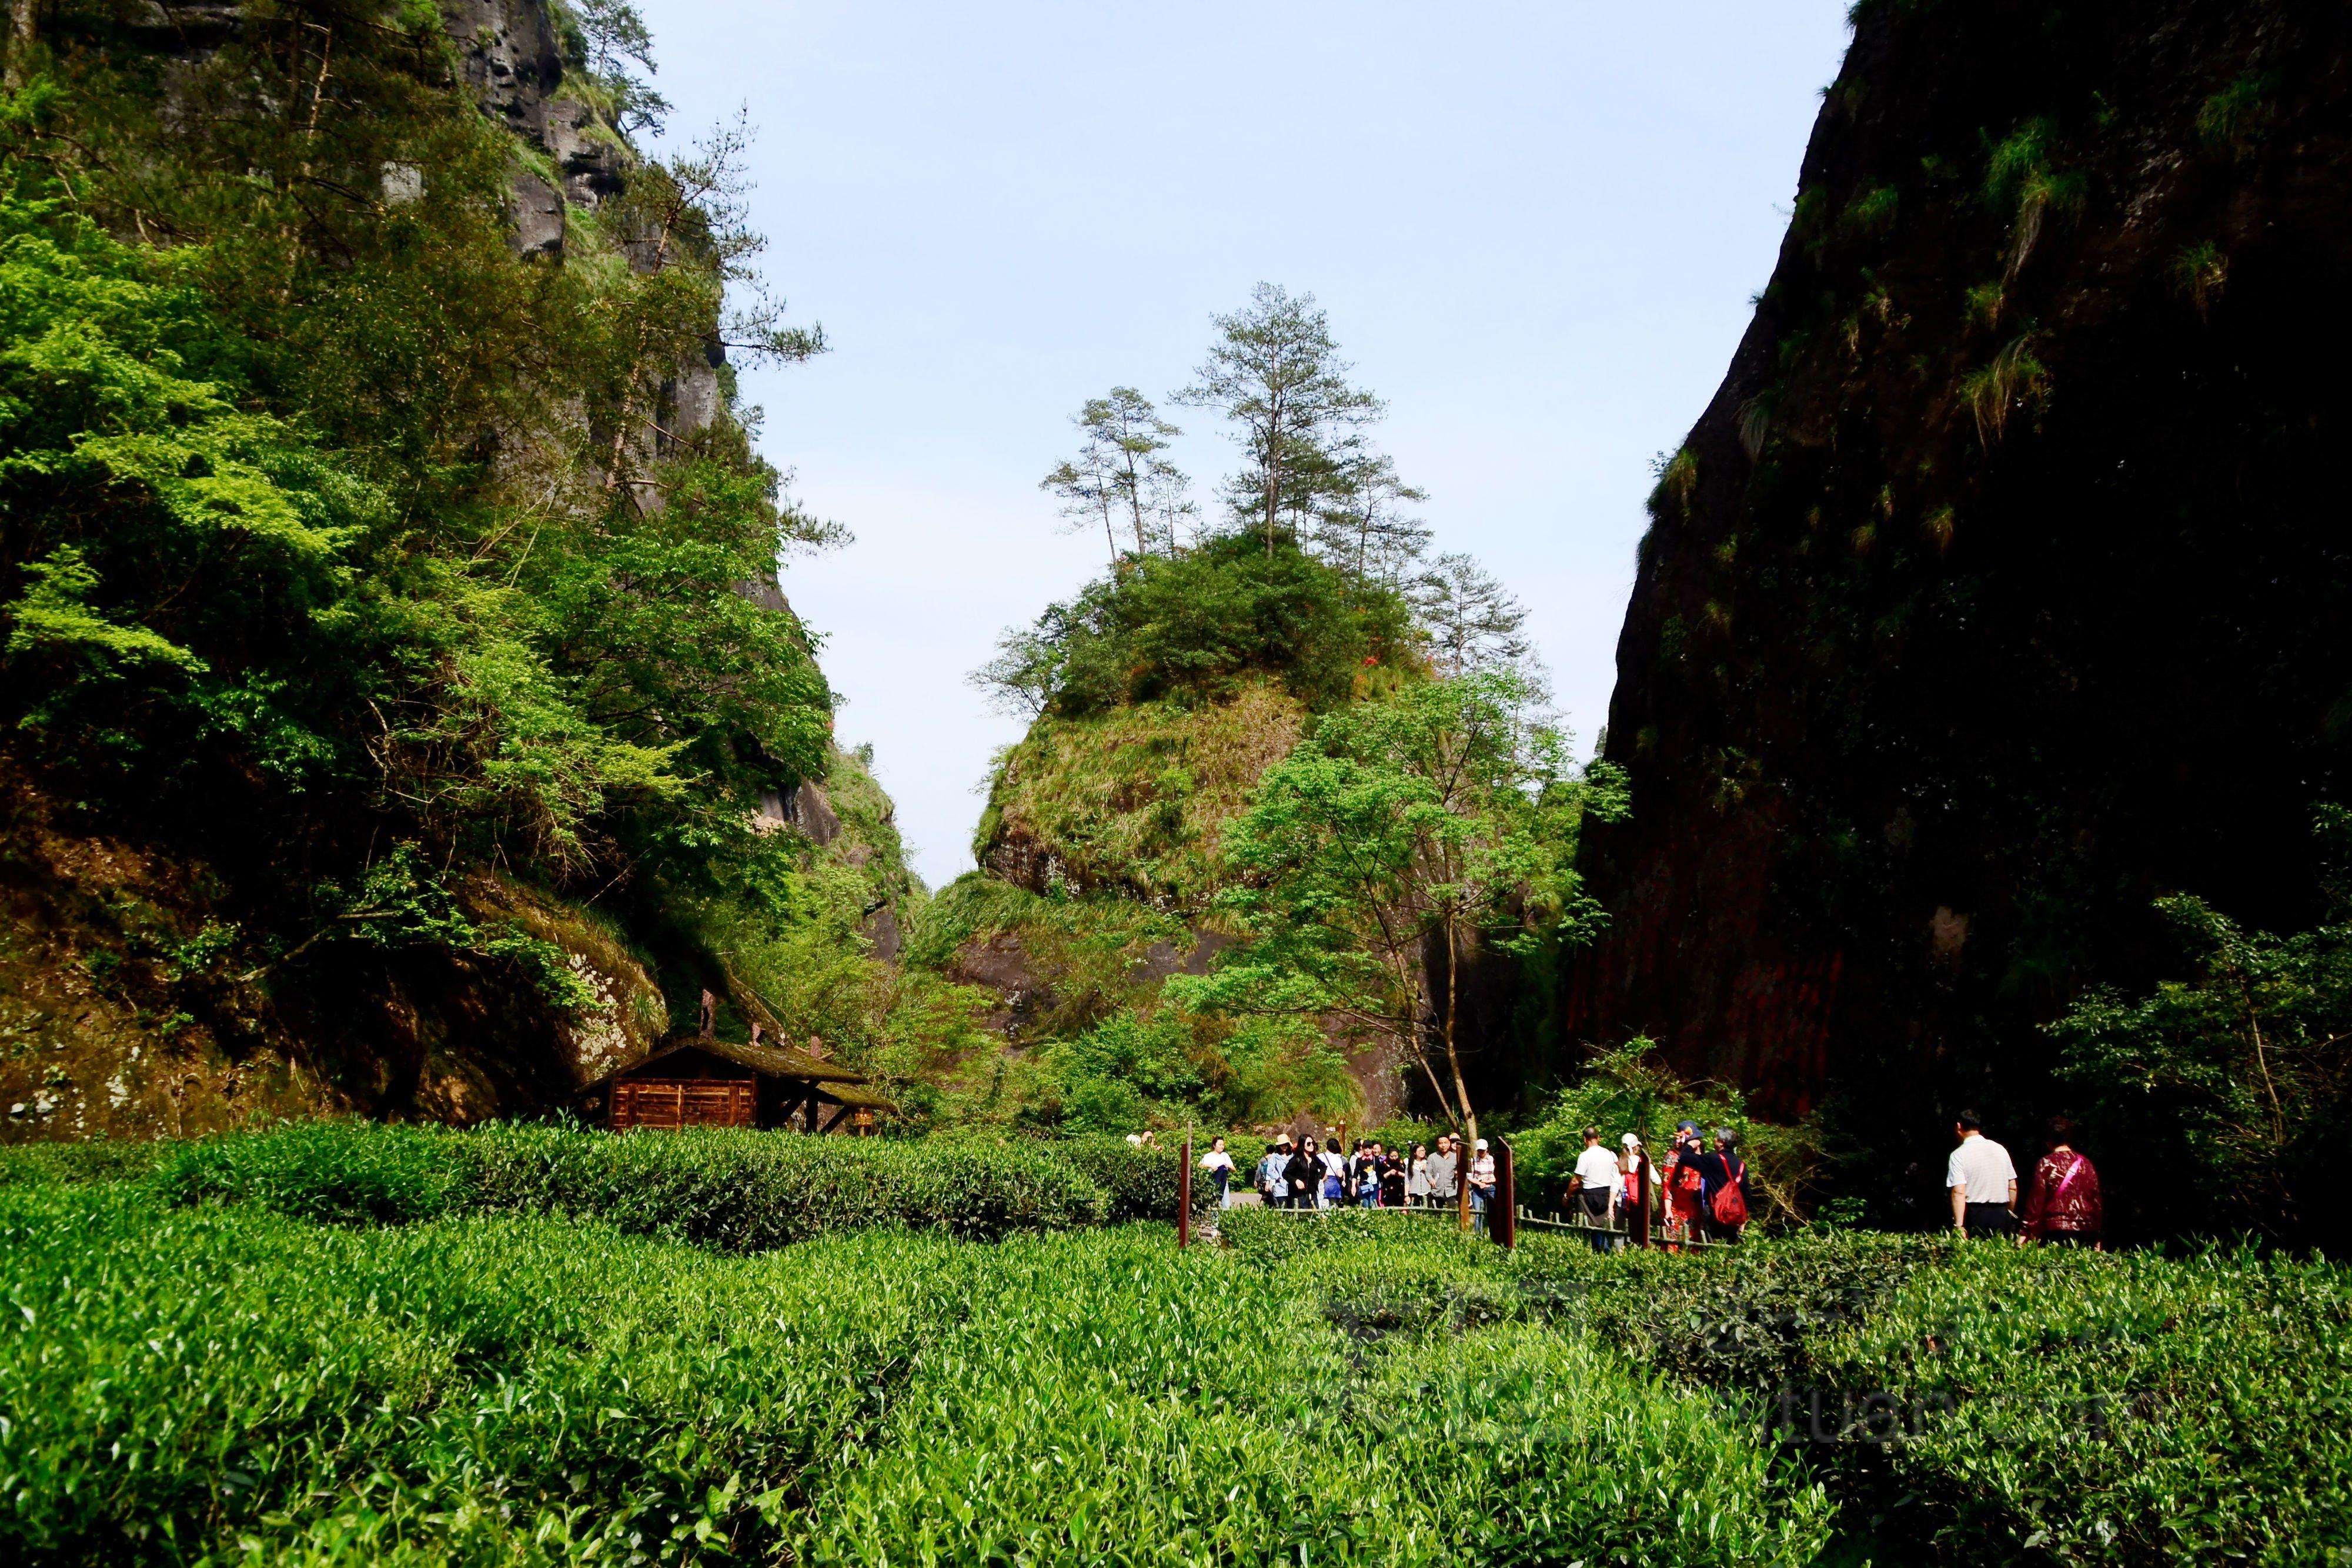 WeiXin_2861633949: 夏天的时候和家里人去了一次,风景非常好看。从山下到山顶一路上都是各种茶树。在这里也看到了大红袍的母树,导游说所有的武夷山大红袍都是从这几棵母树上分下来的(但是母树看上去很瘦小不知道... 大家认为: